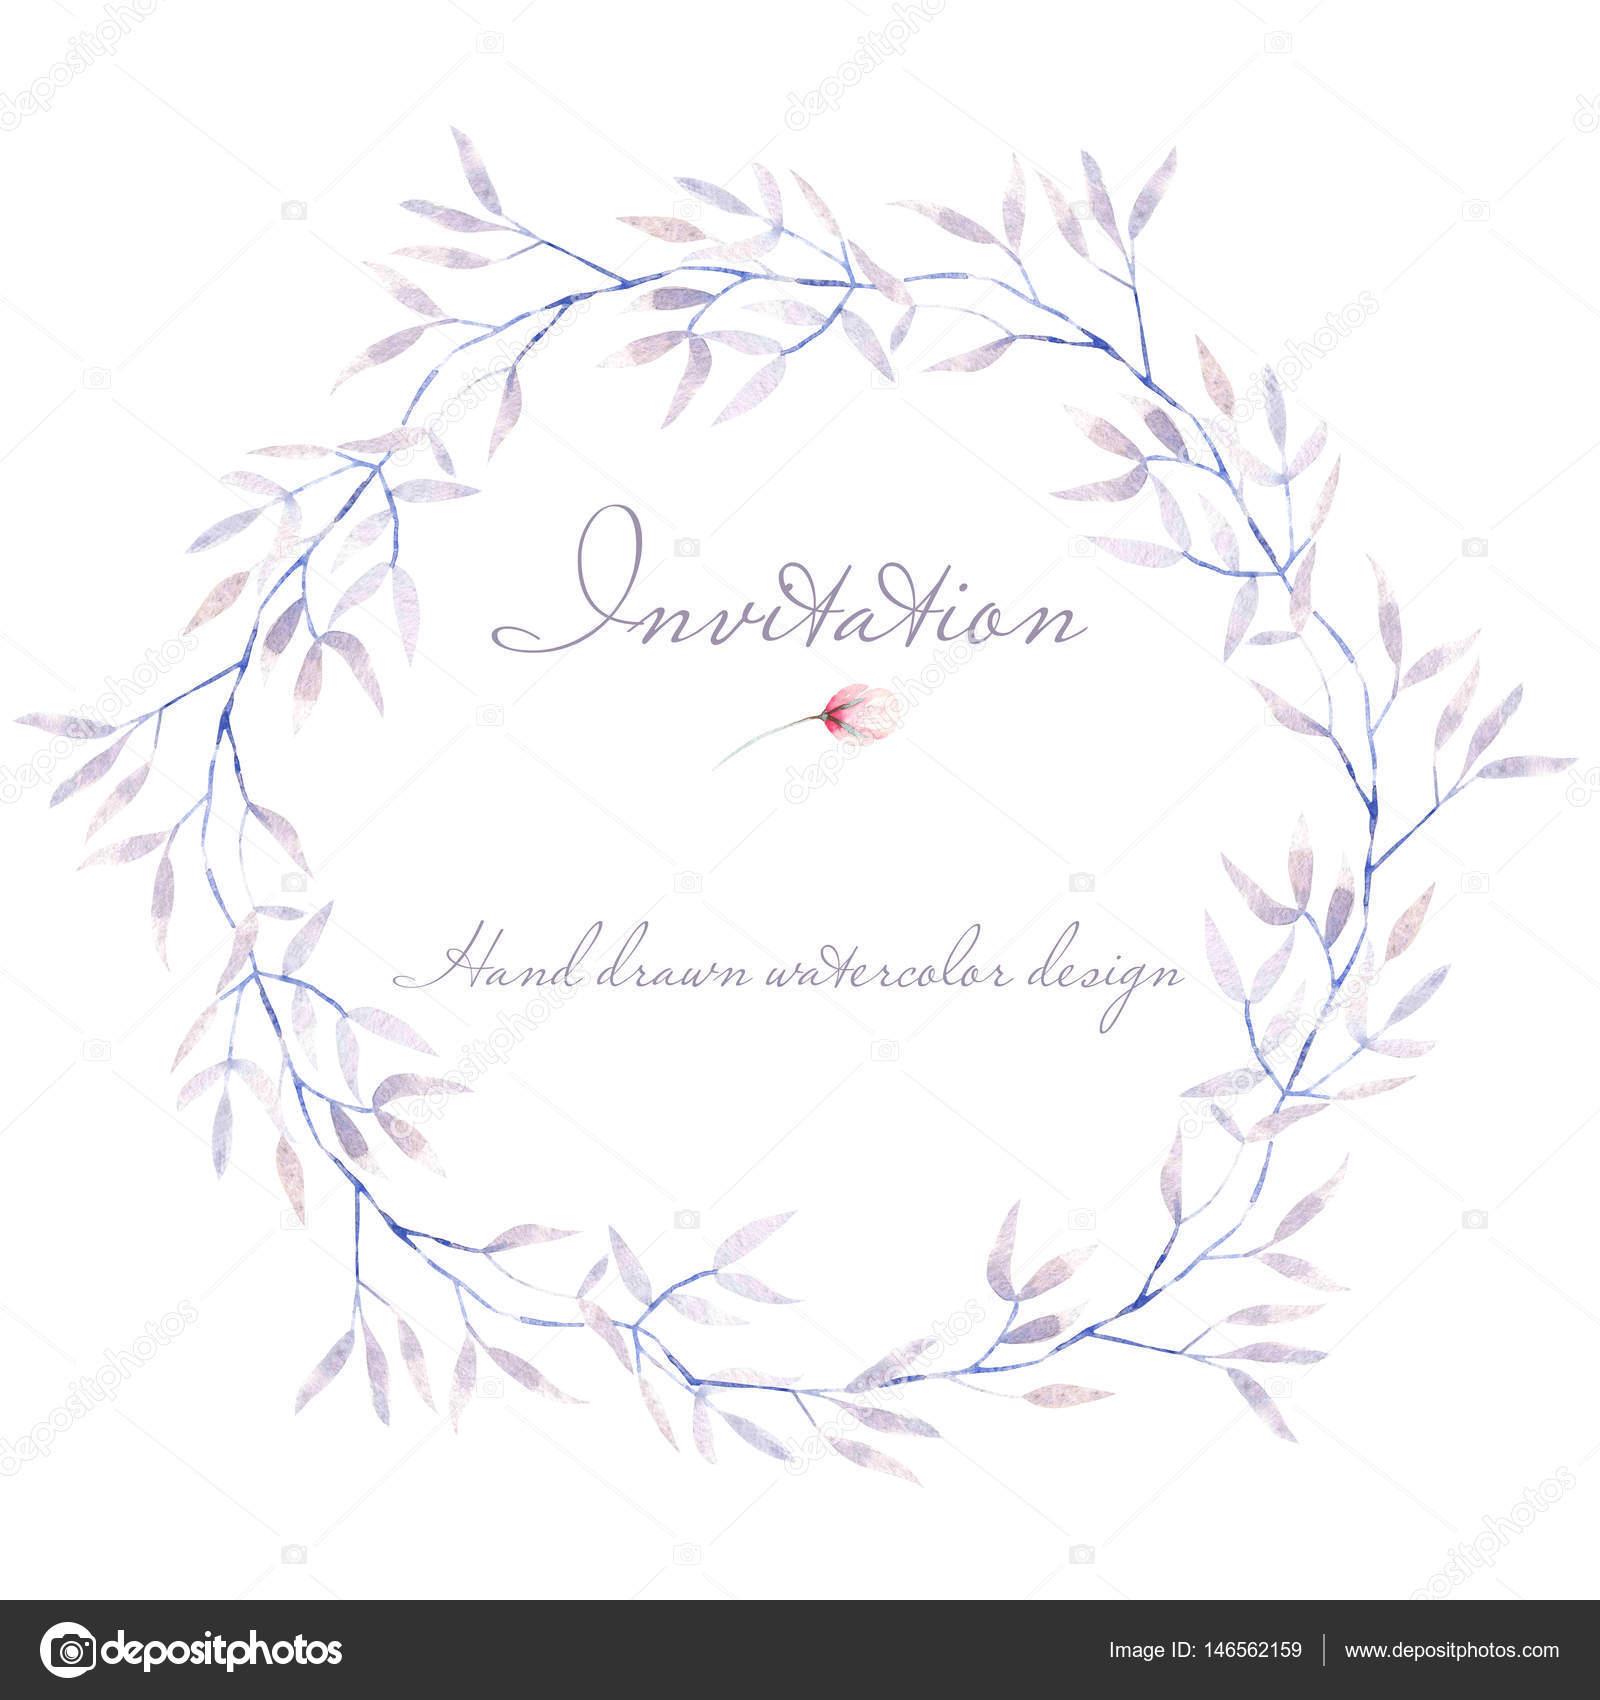 Marco de círculo, frontera, corona con ramas de árbol púrpura tierna ...